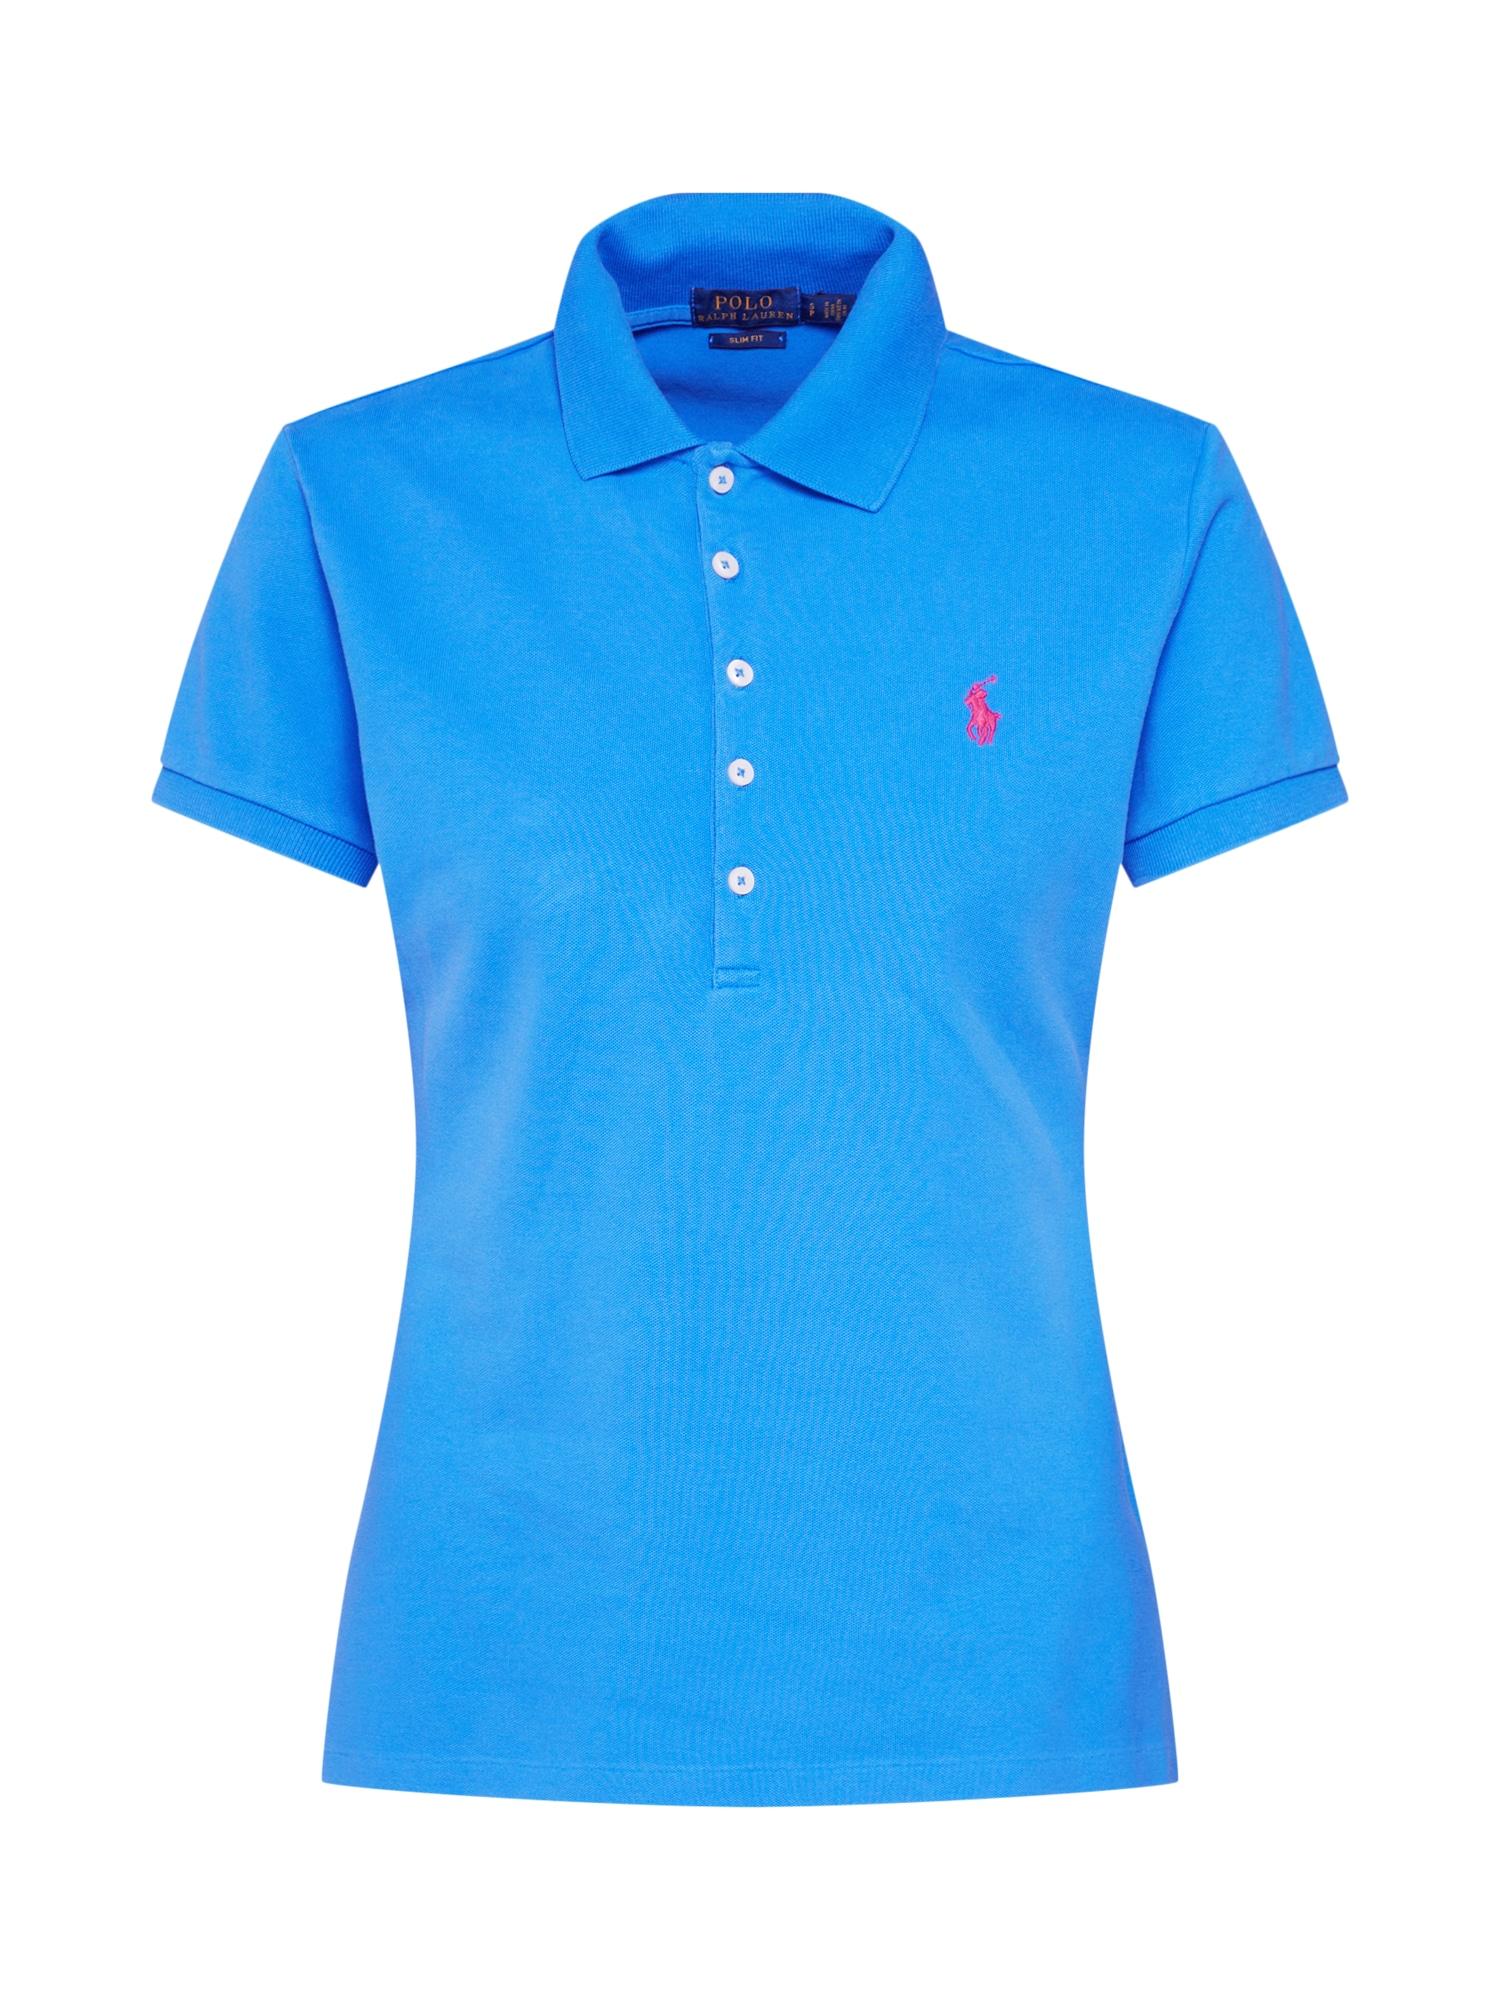 Tričko JULIE modrá červená POLO RALPH LAUREN